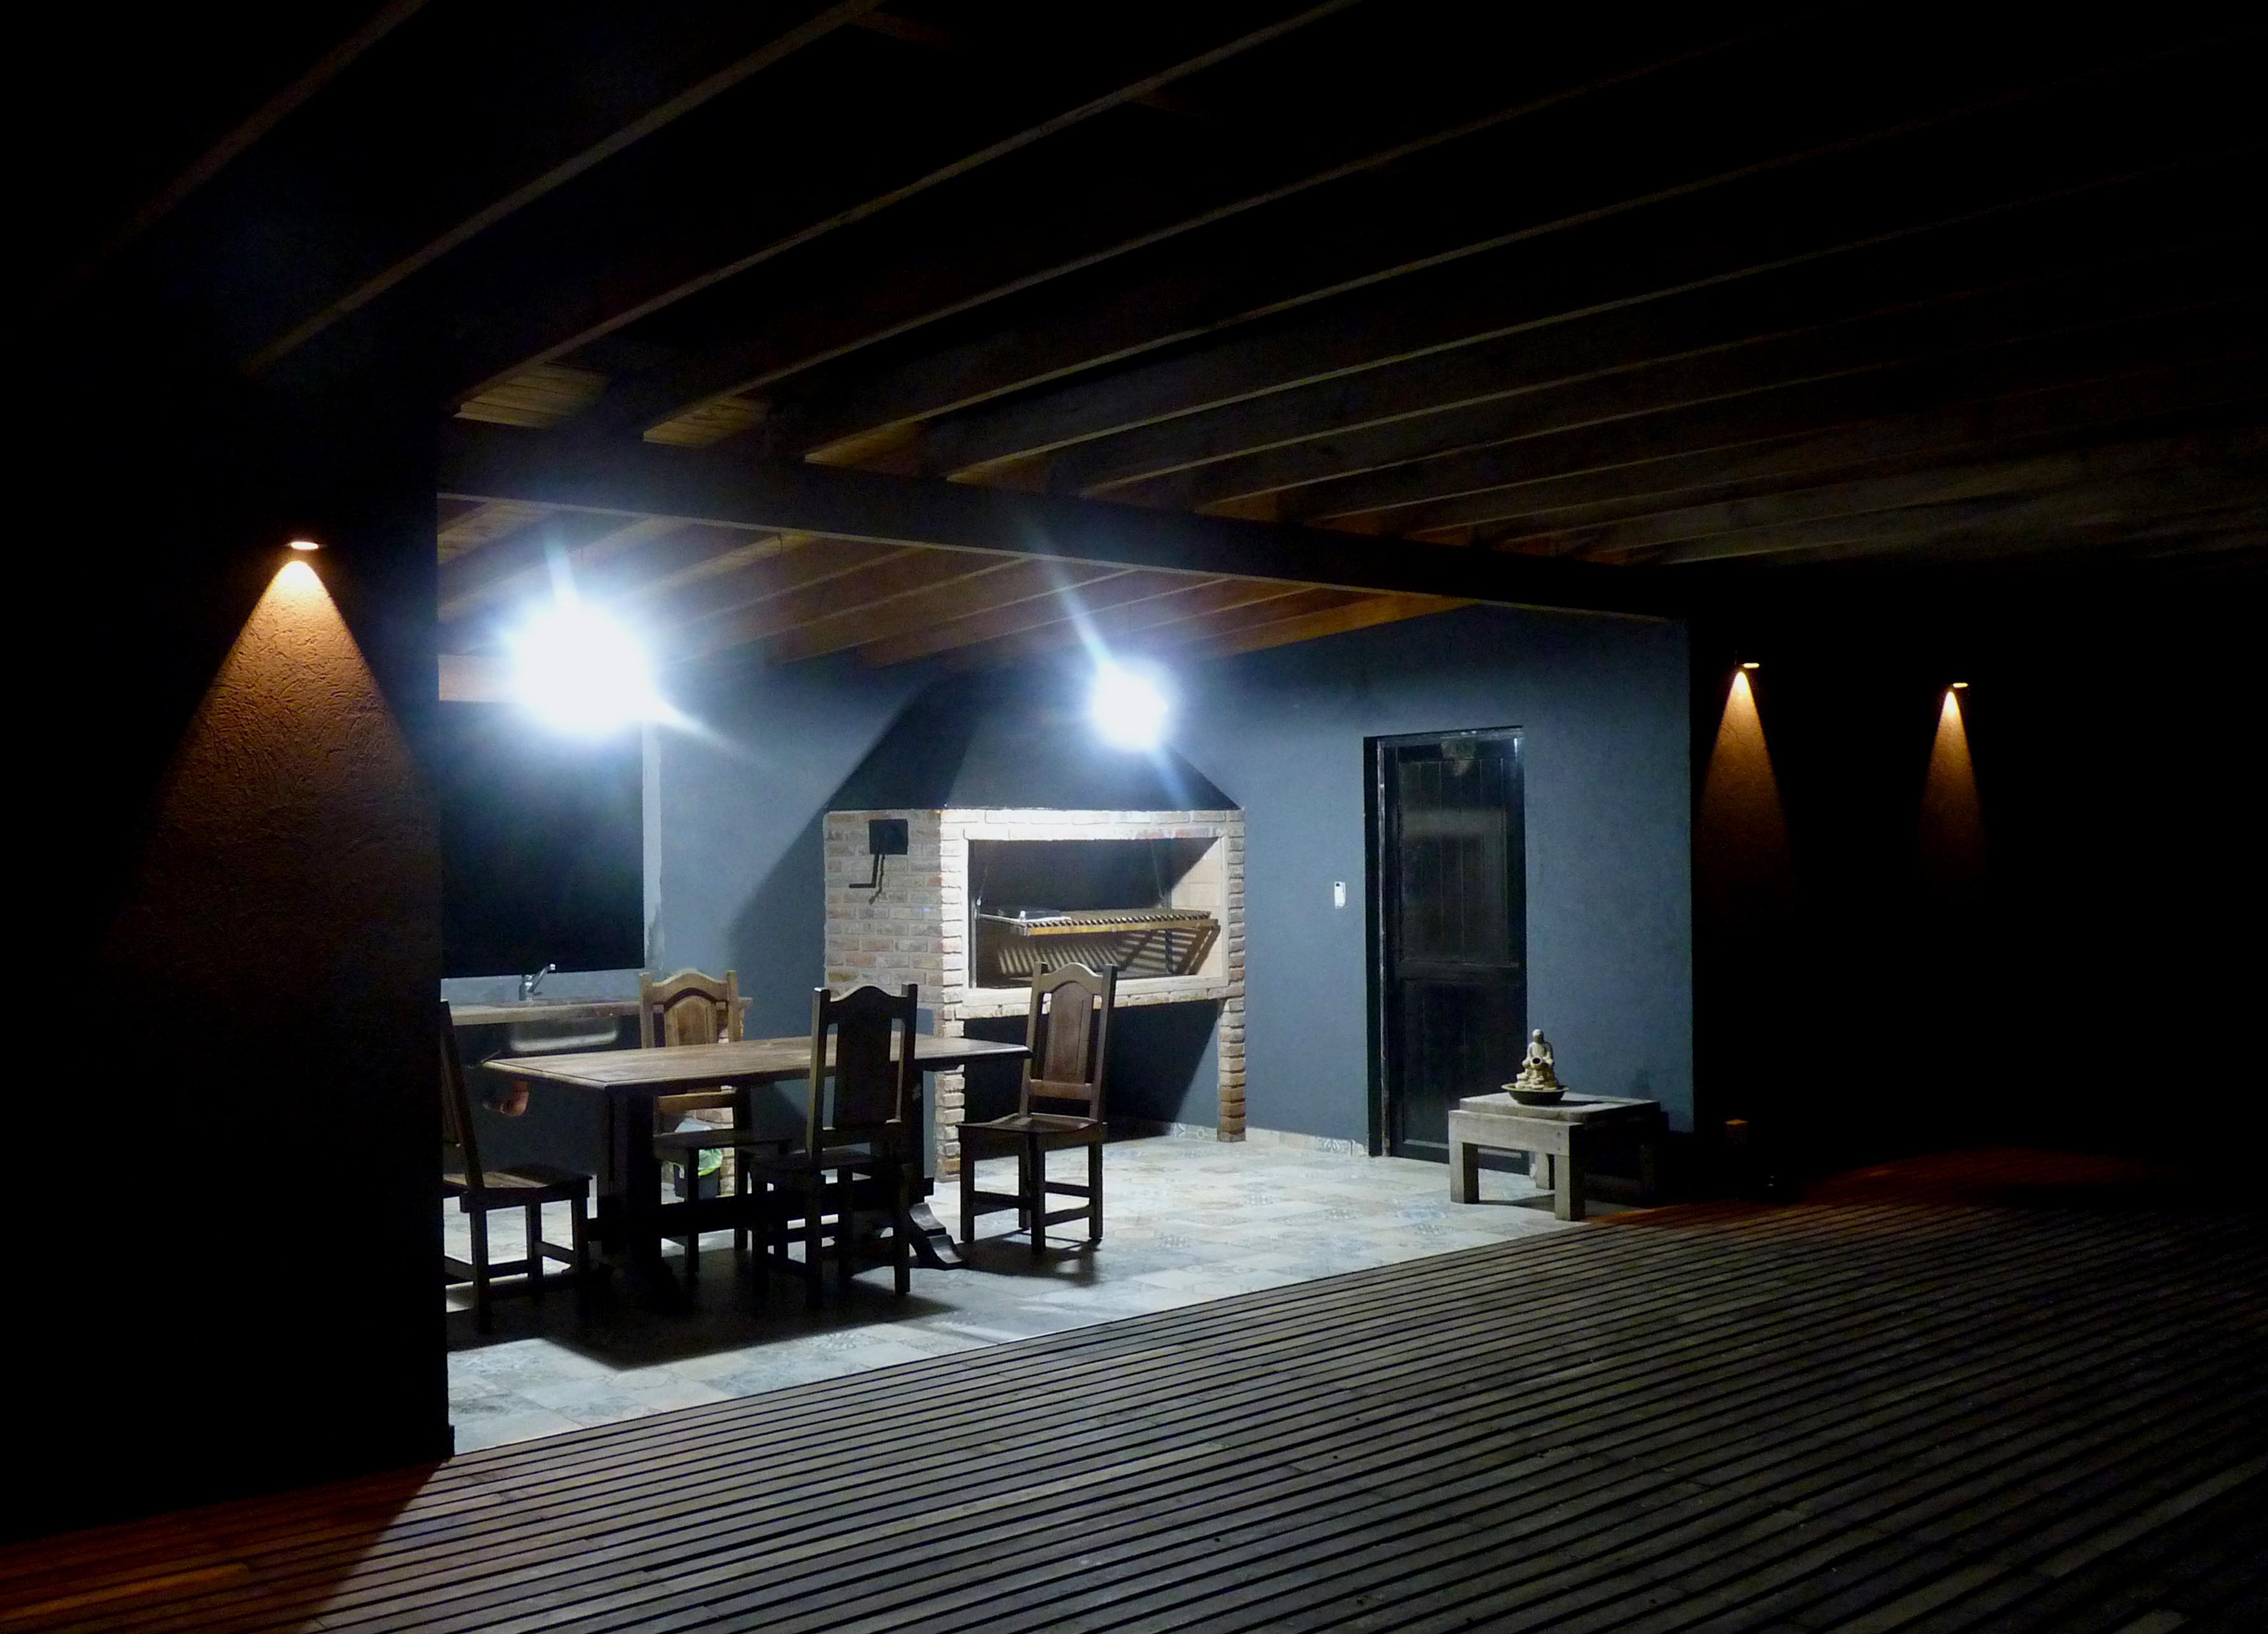 Quincho Externo, parrilla iluminada para uso nocturno casona del rio